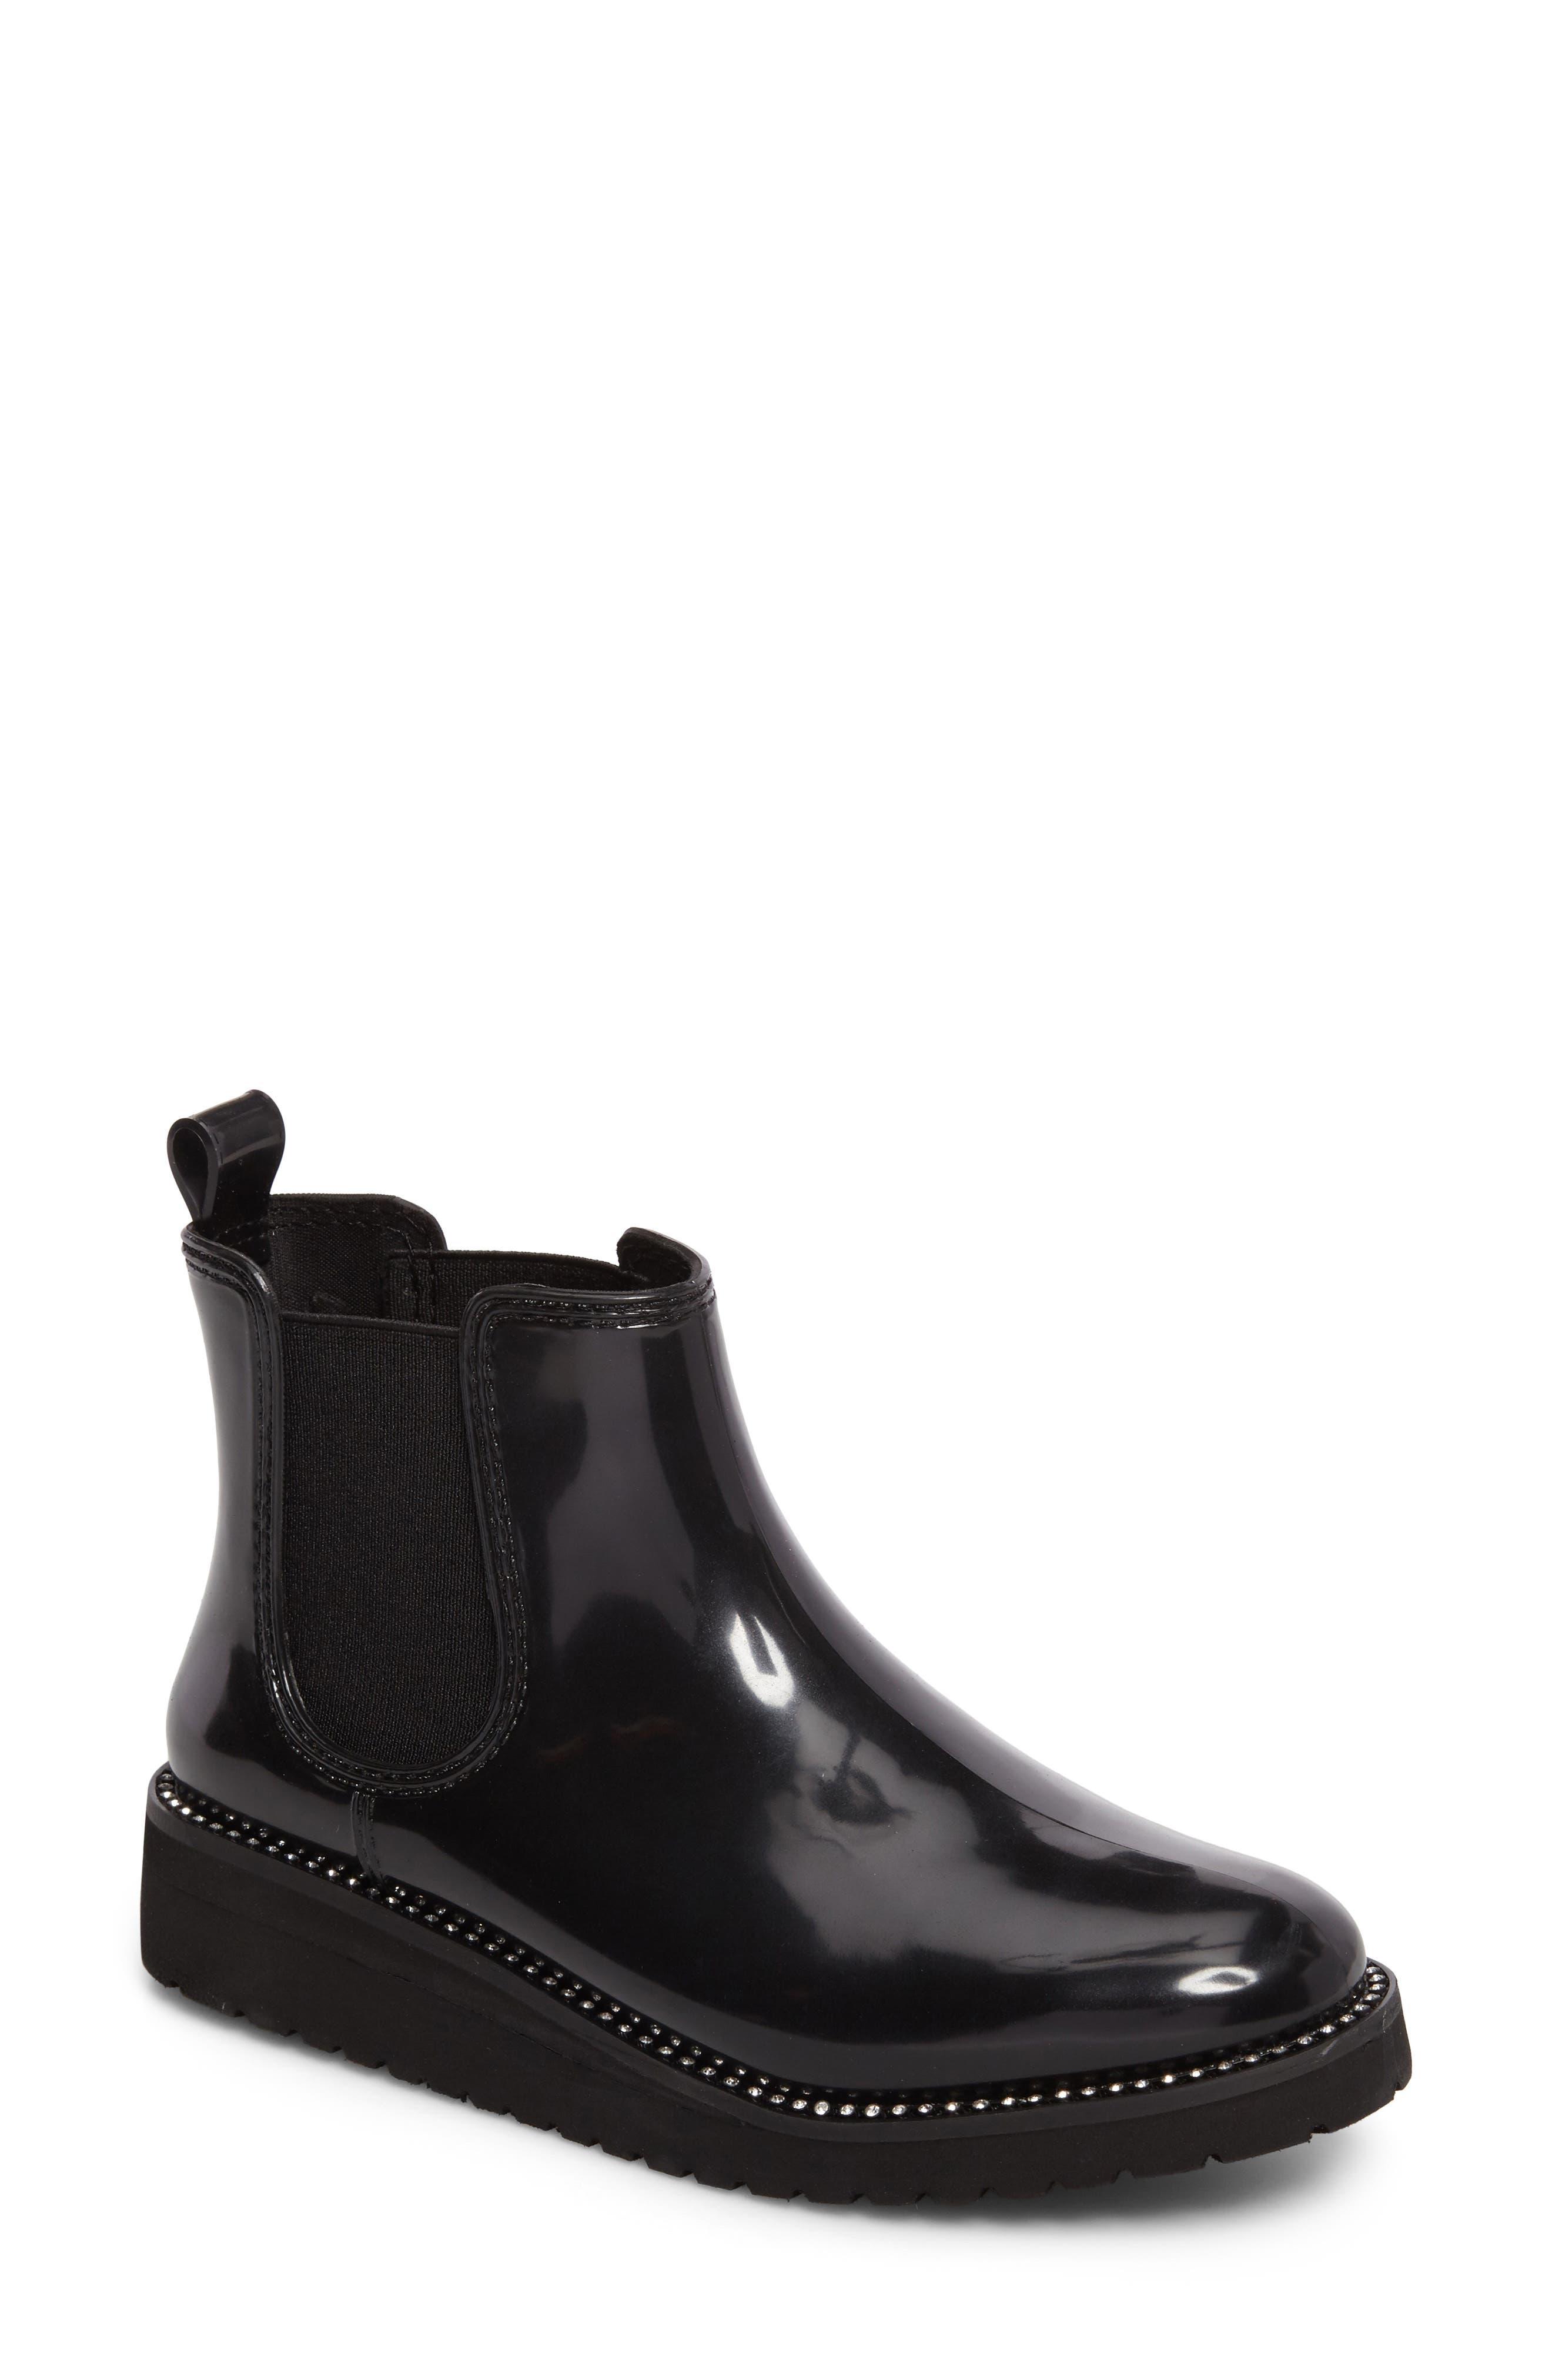 Cougar Kerry Waterproof Chelsea Boot (Women)